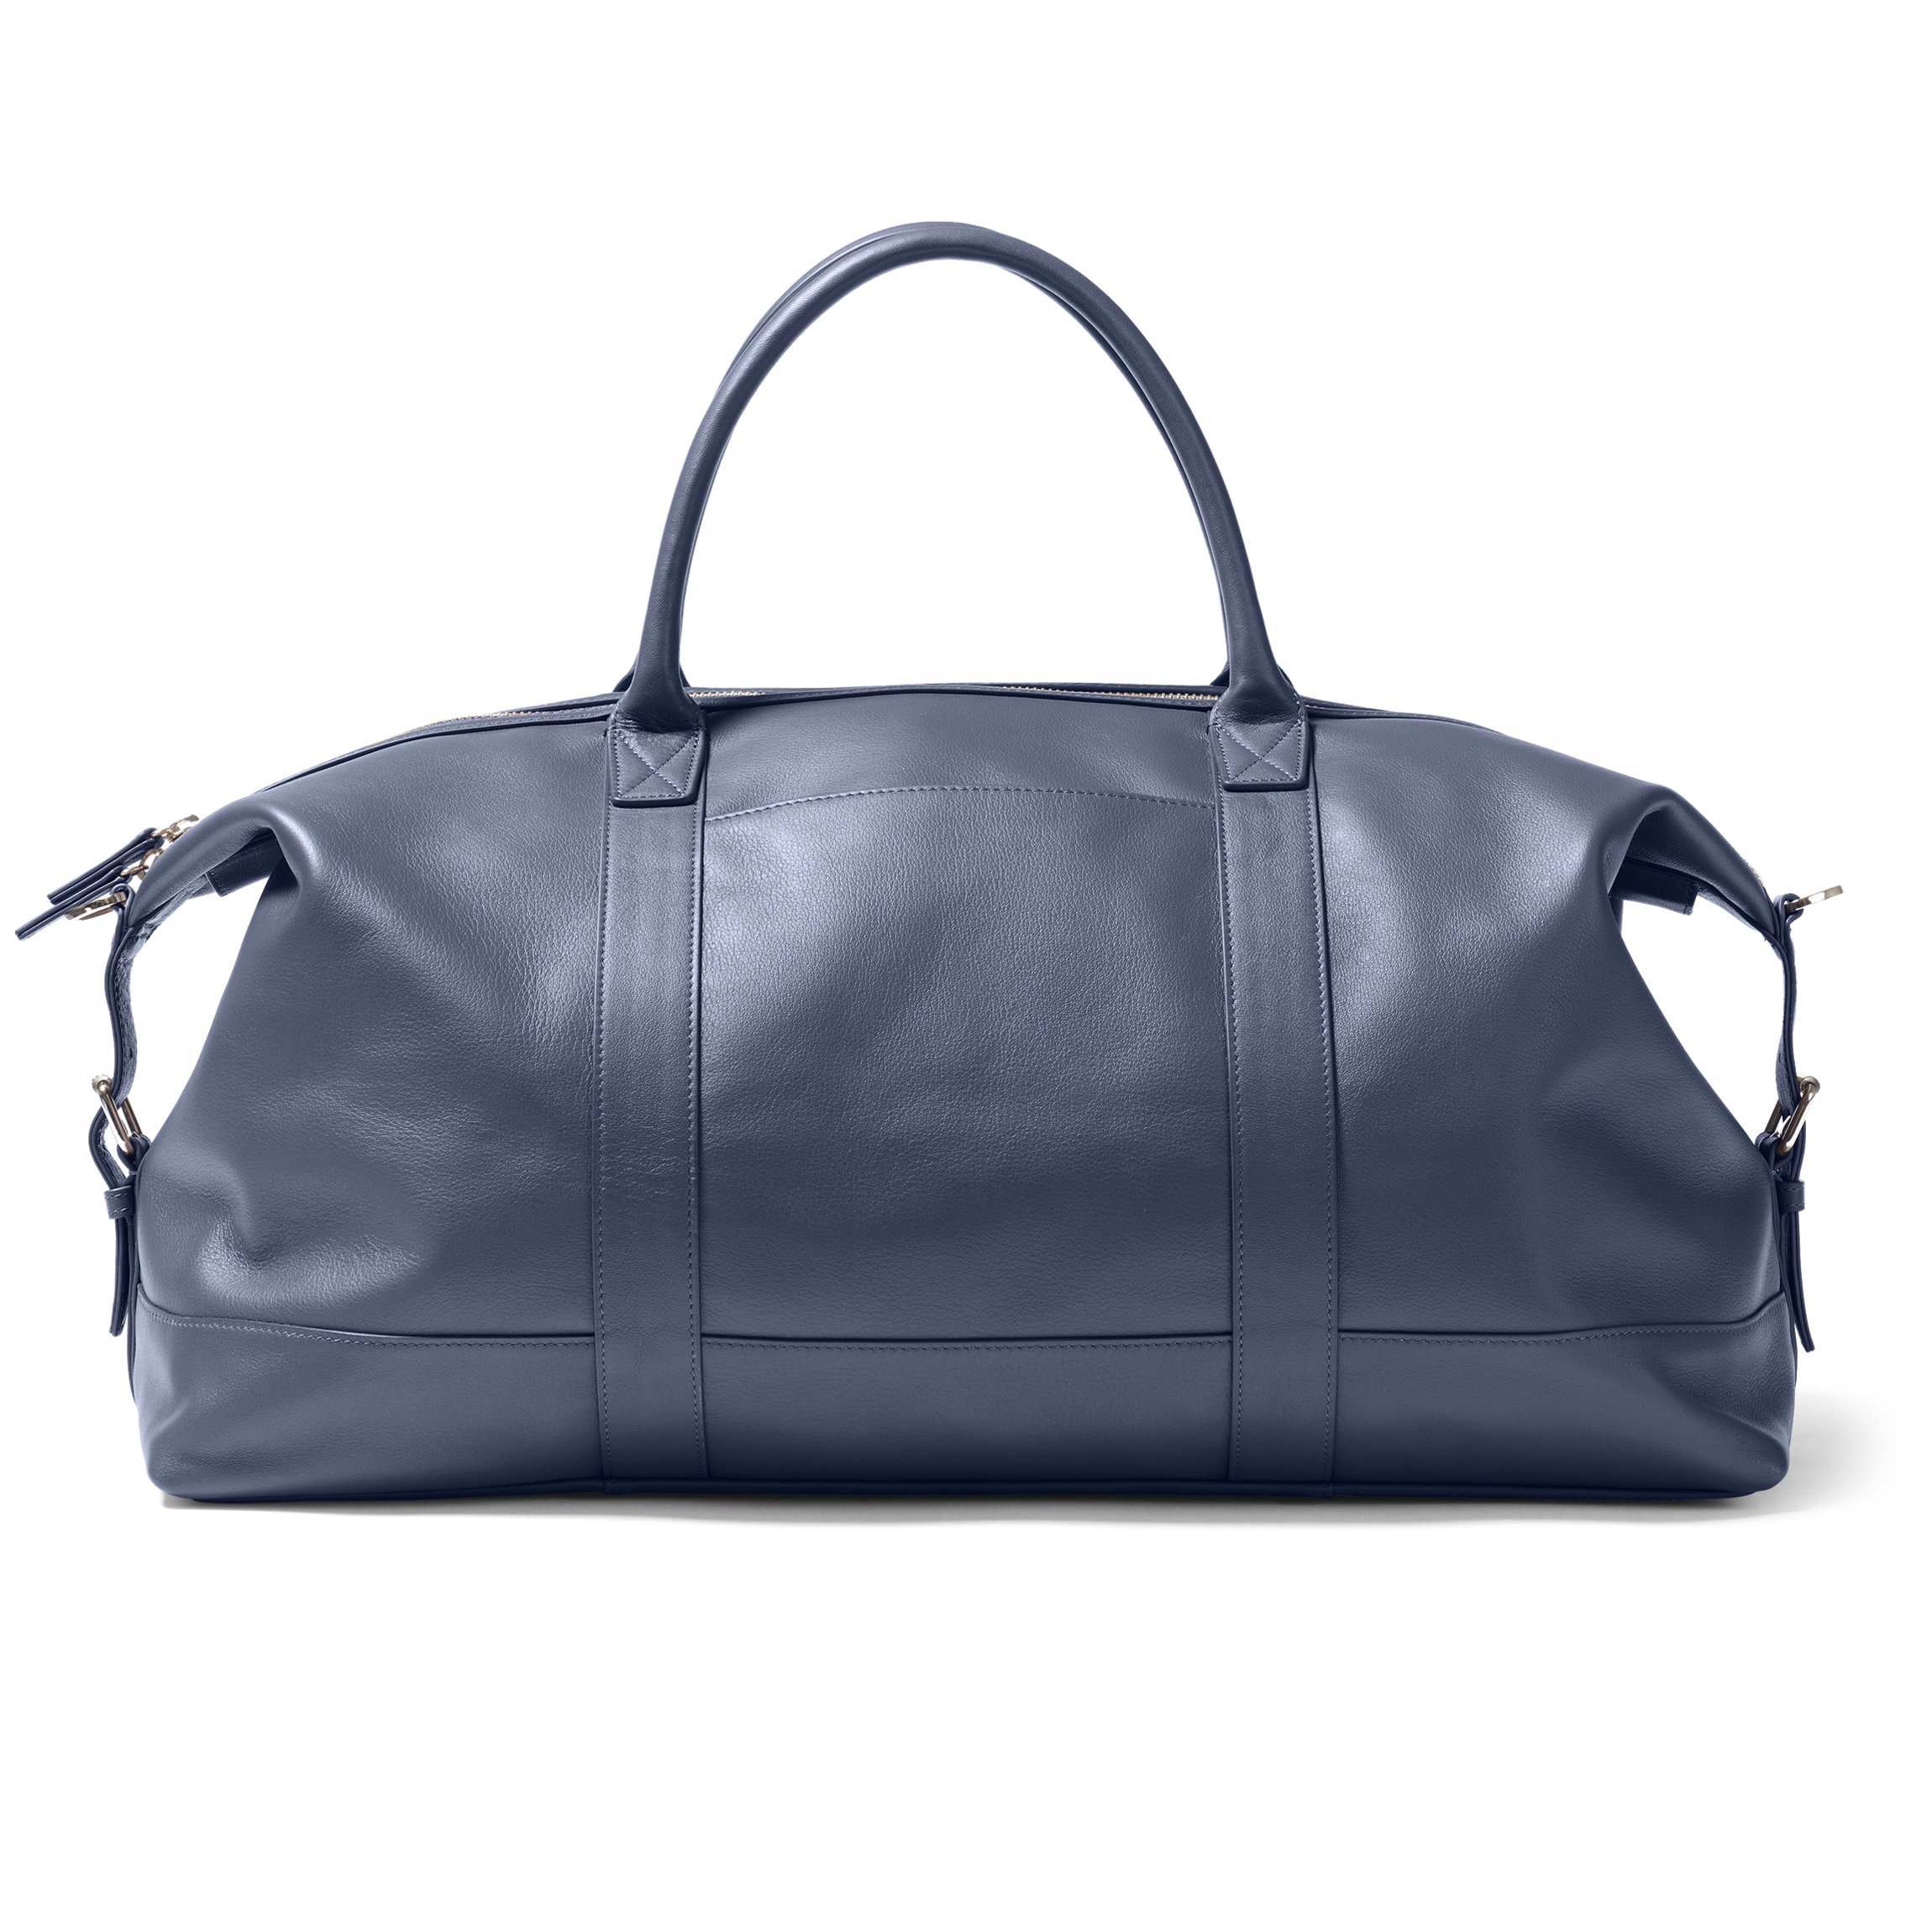 Kessler Medium Duffle - Full Grain Leather Leather - Navy (blue) by Leatherology (Image #1)